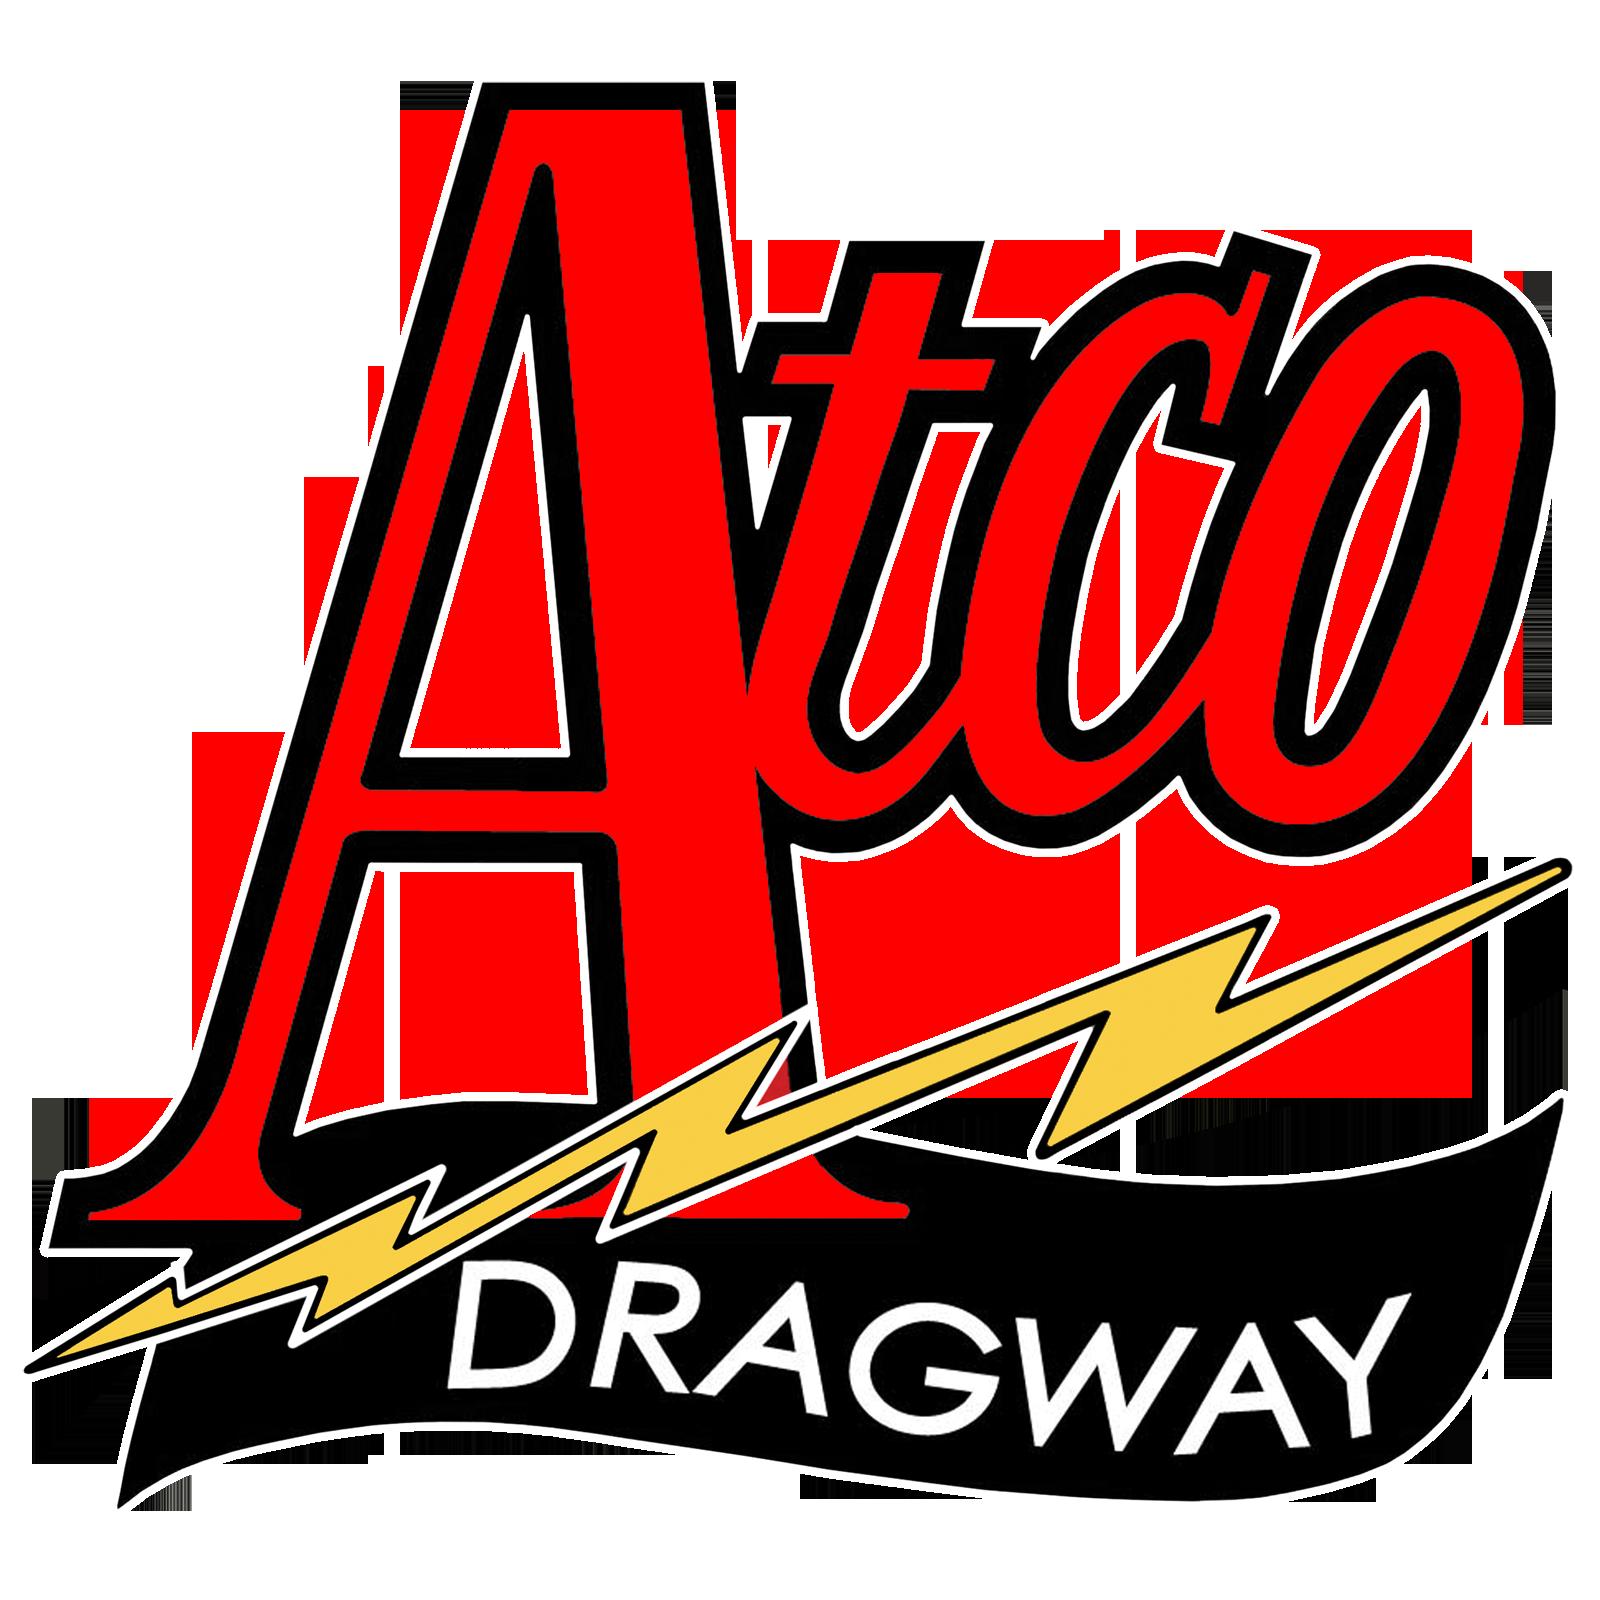 Atco Dragway 2013 transparent bkgd.png